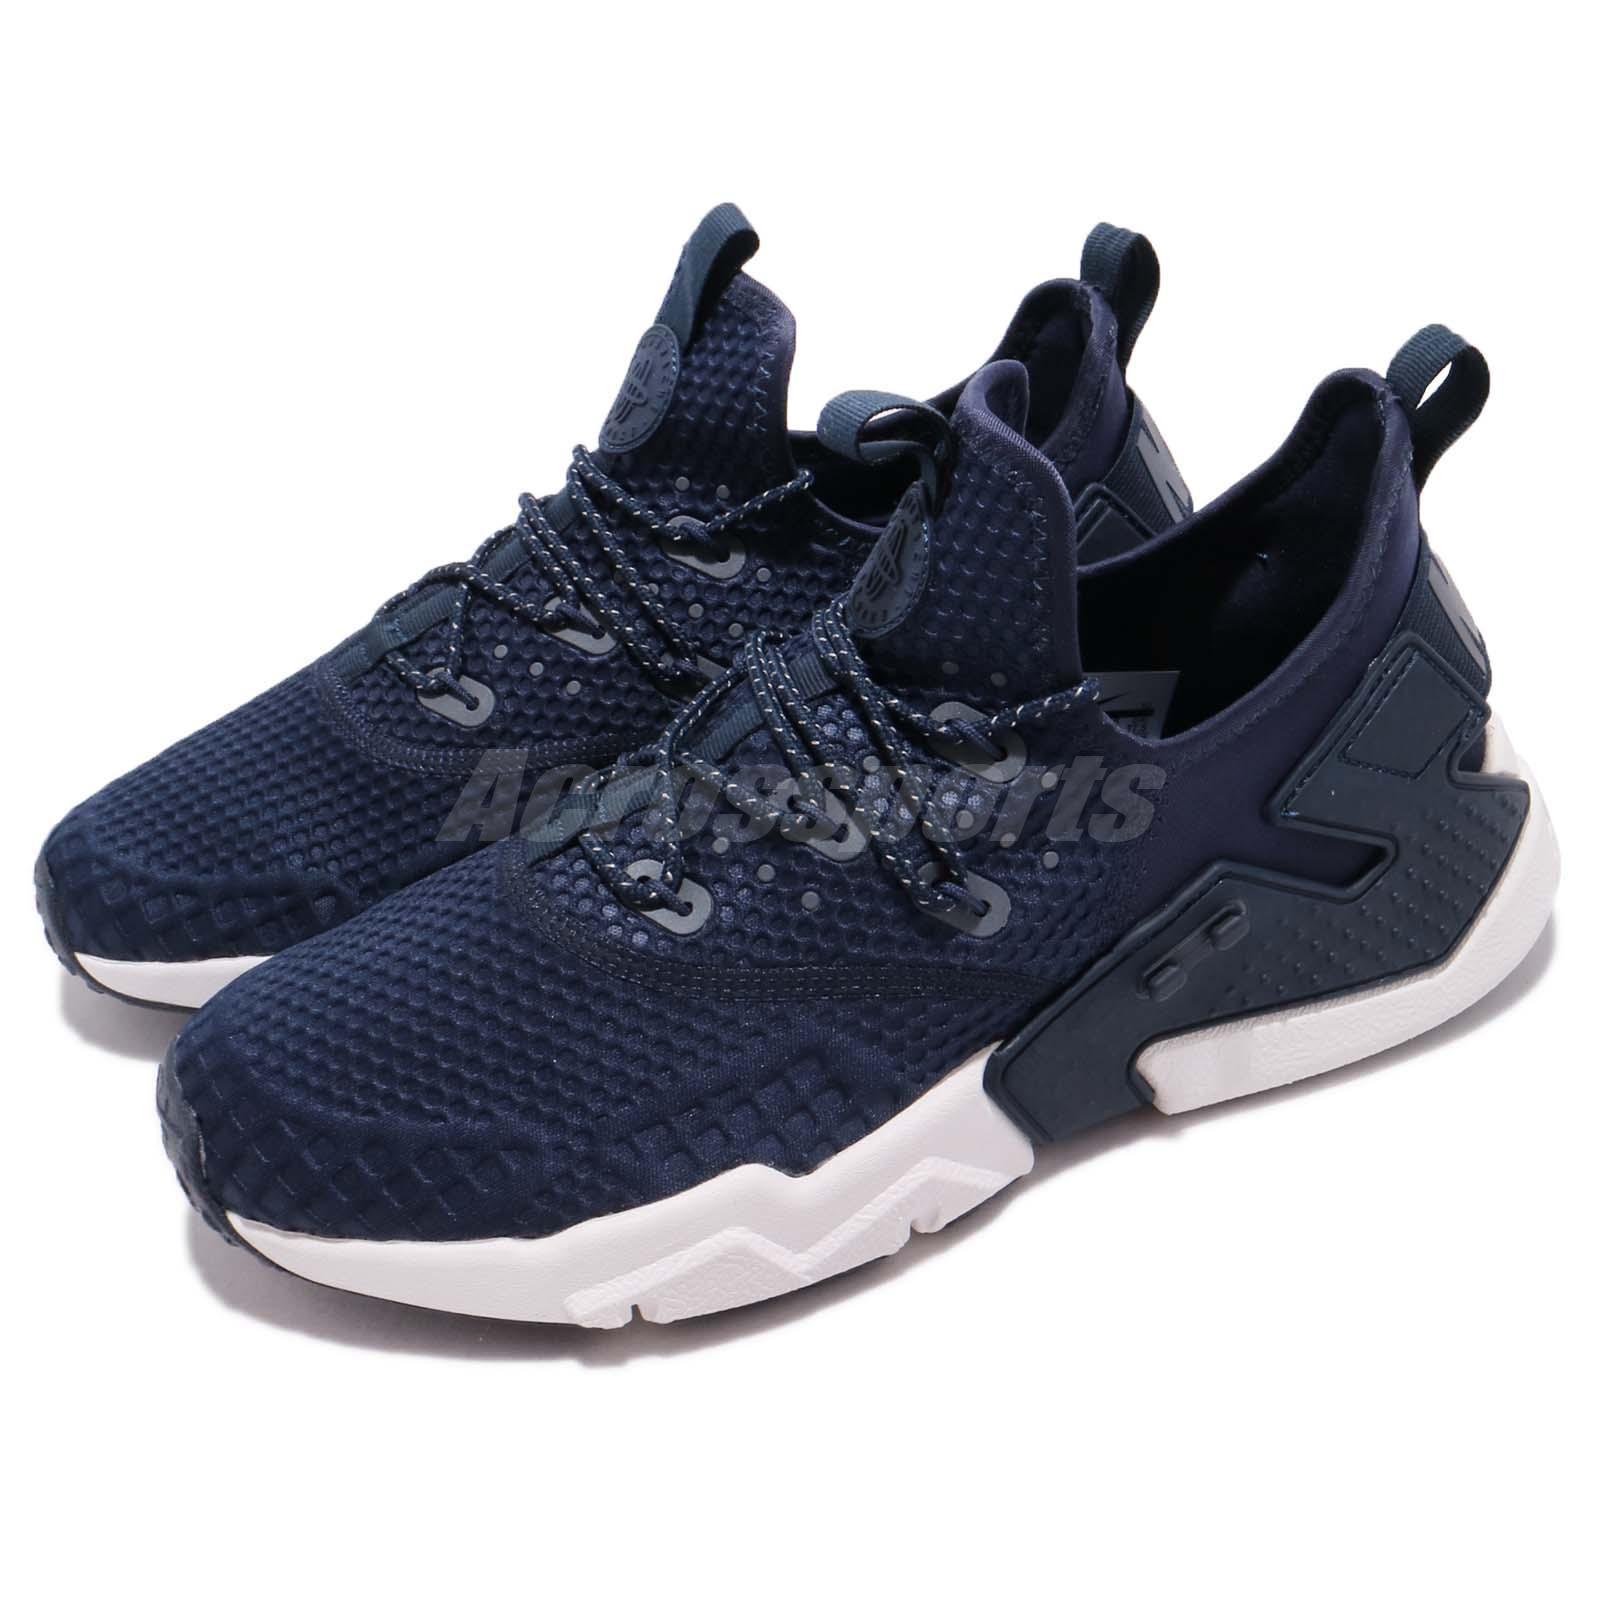 71566a27ac0c5 Details about Nike Air Huarache Drift SE Navy White Men Running Casual Shoe  Sneaker AO1731-401